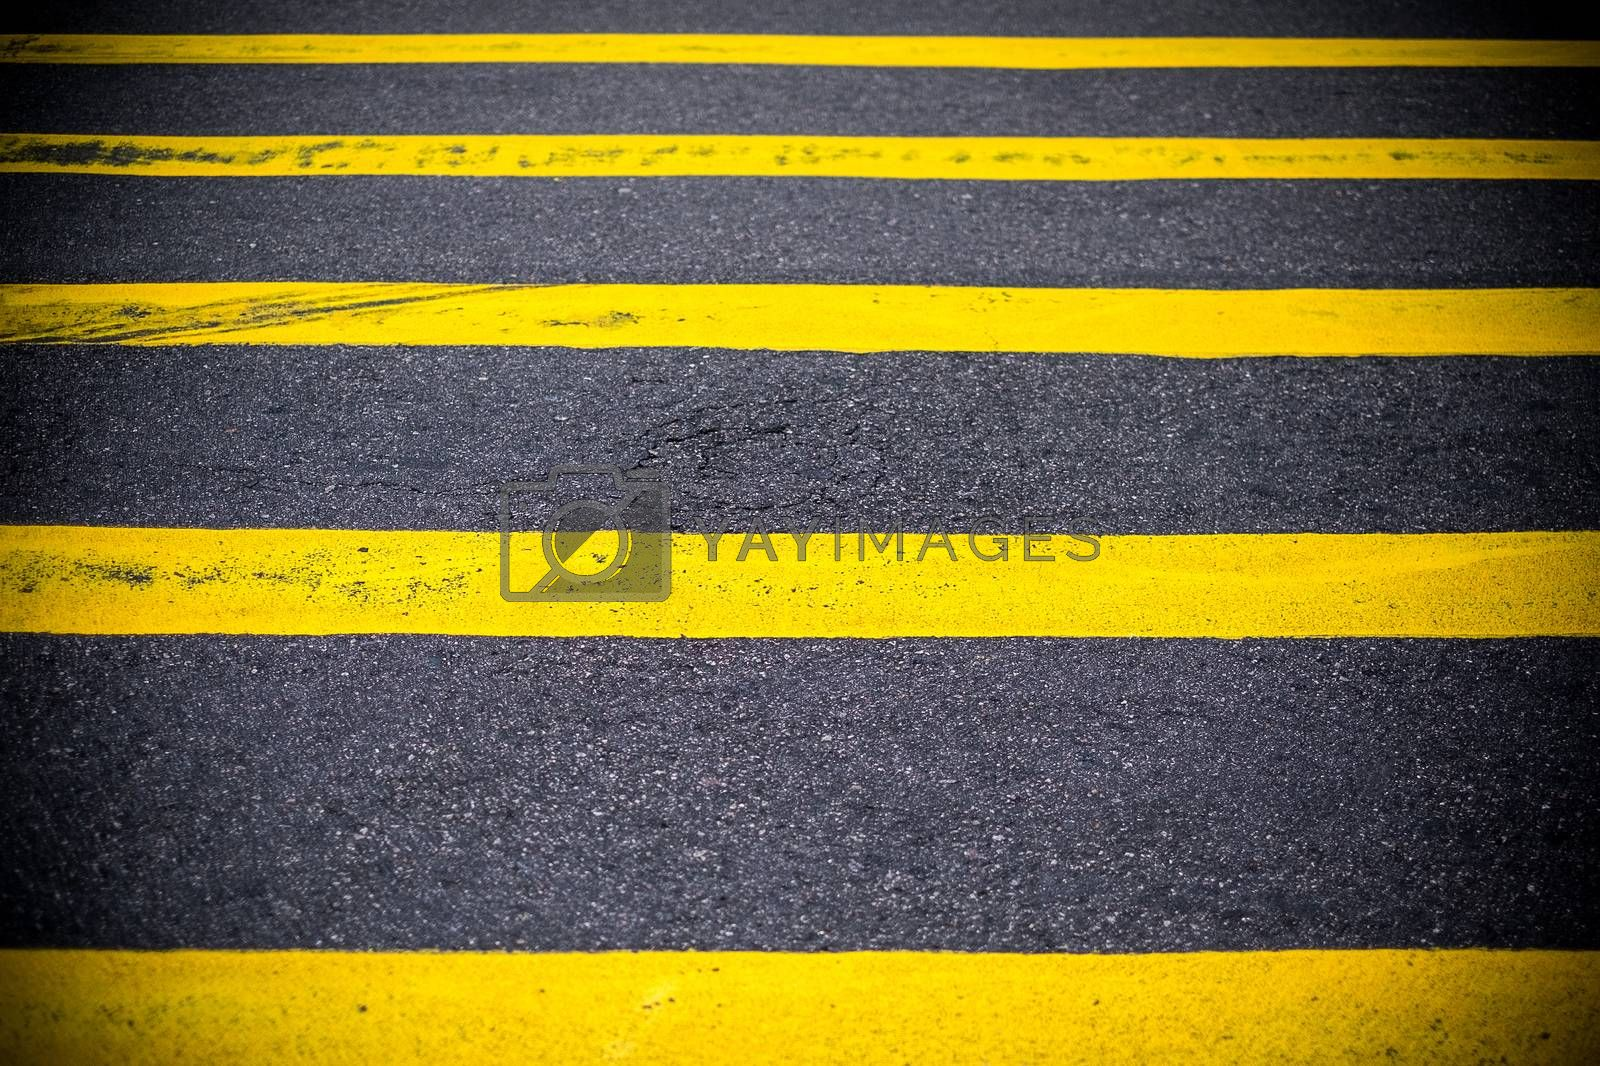 Road Marking Yellow Lines on asphalt